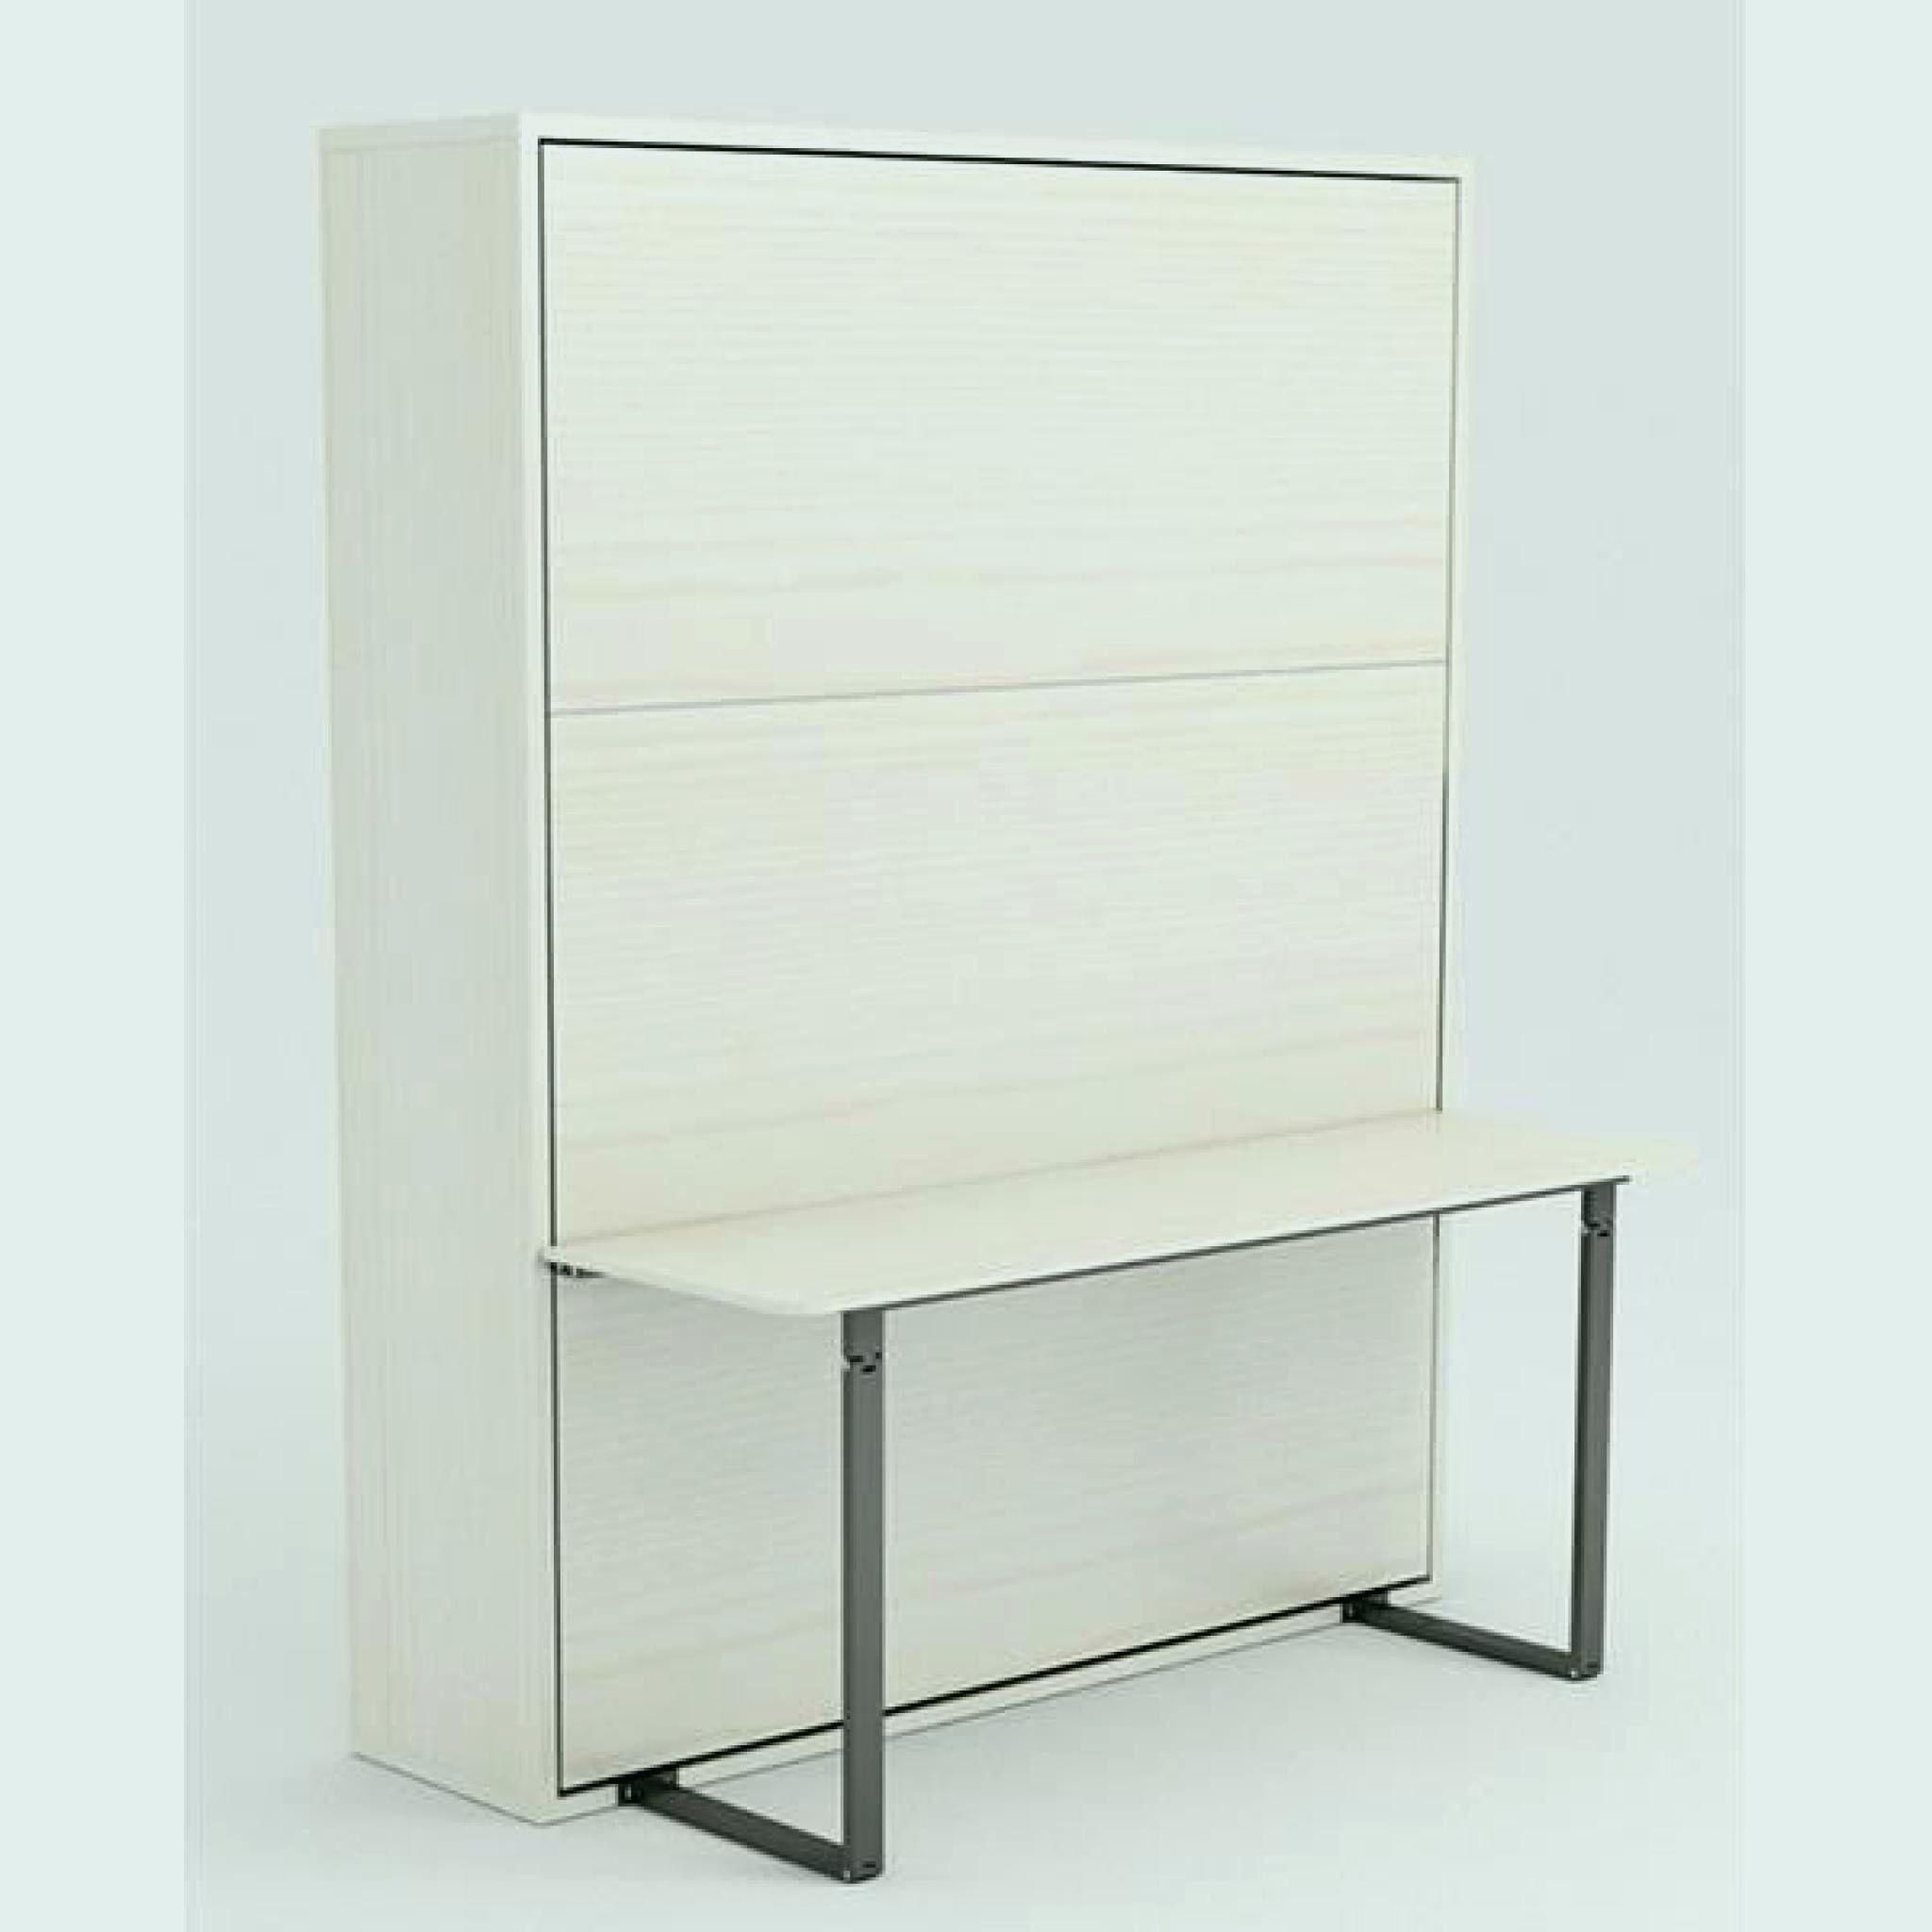 Lit Combiné Bureau Ikea Frais Lit Biné Armoire Lovely Lit Bureau Armoire Biné élégant Lit